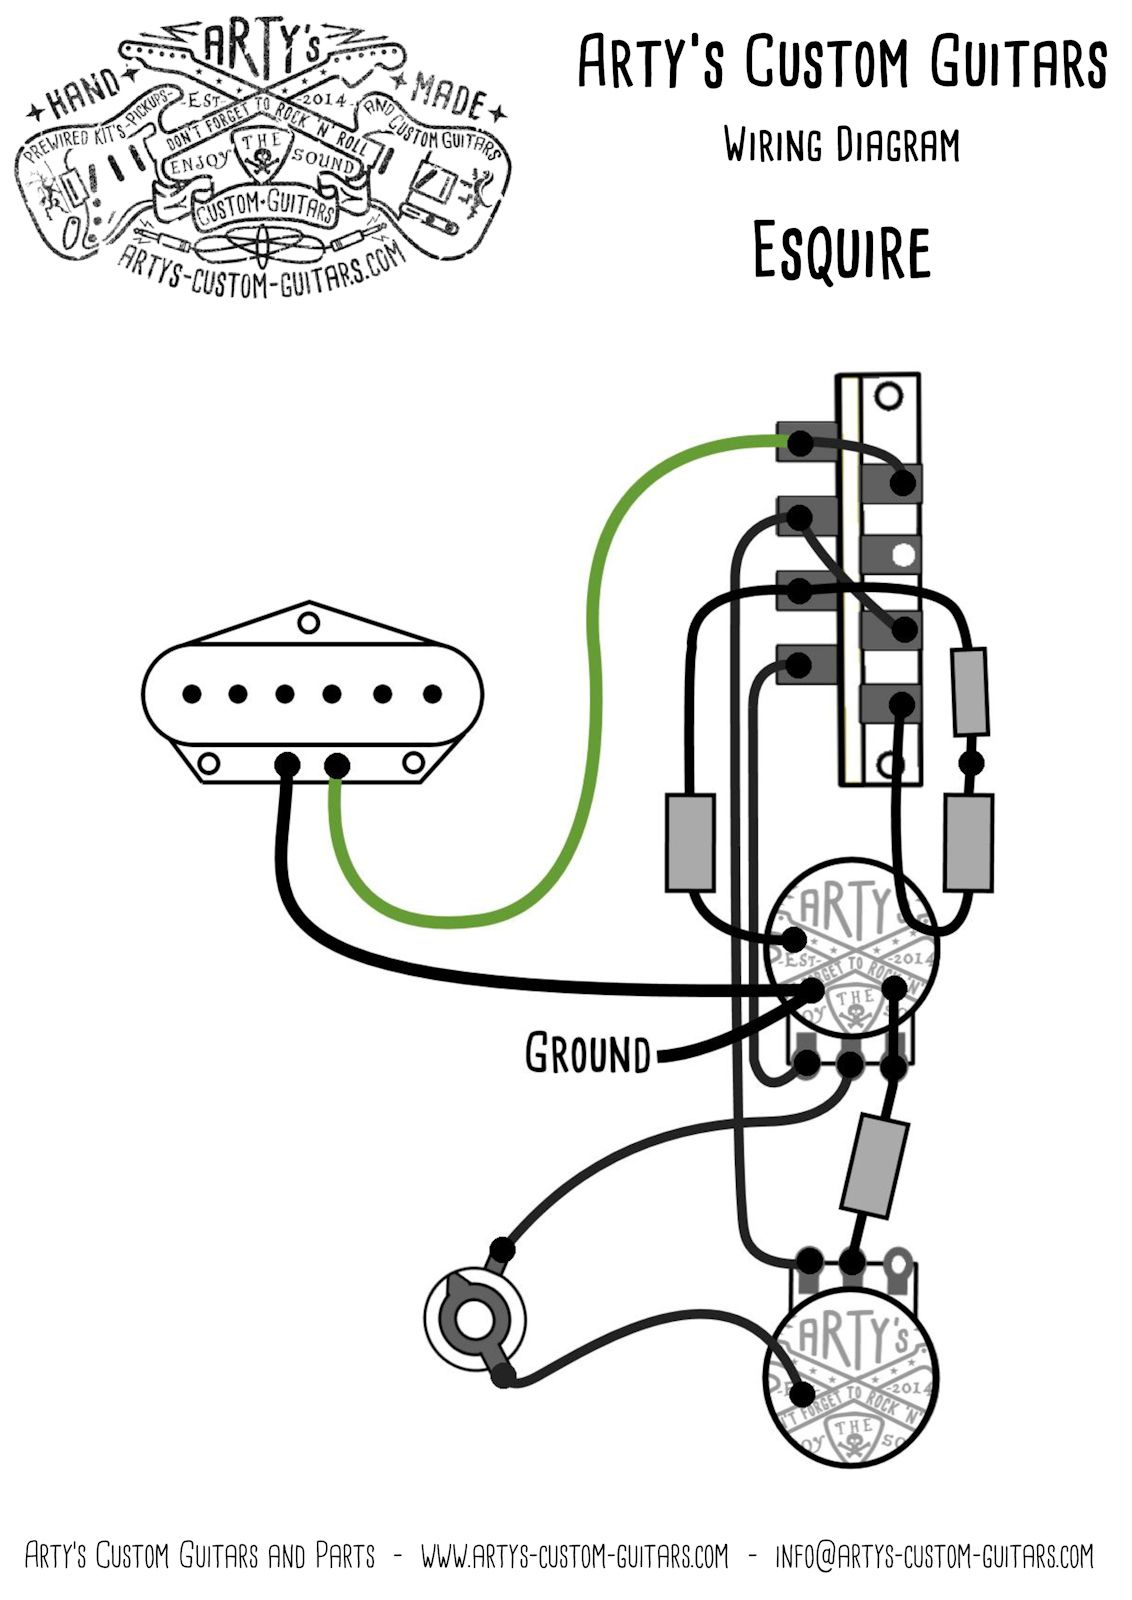 Esquire wiring diagram prewired Kit Arty's Custom Guitars | fender esquire wiring | Pinterest